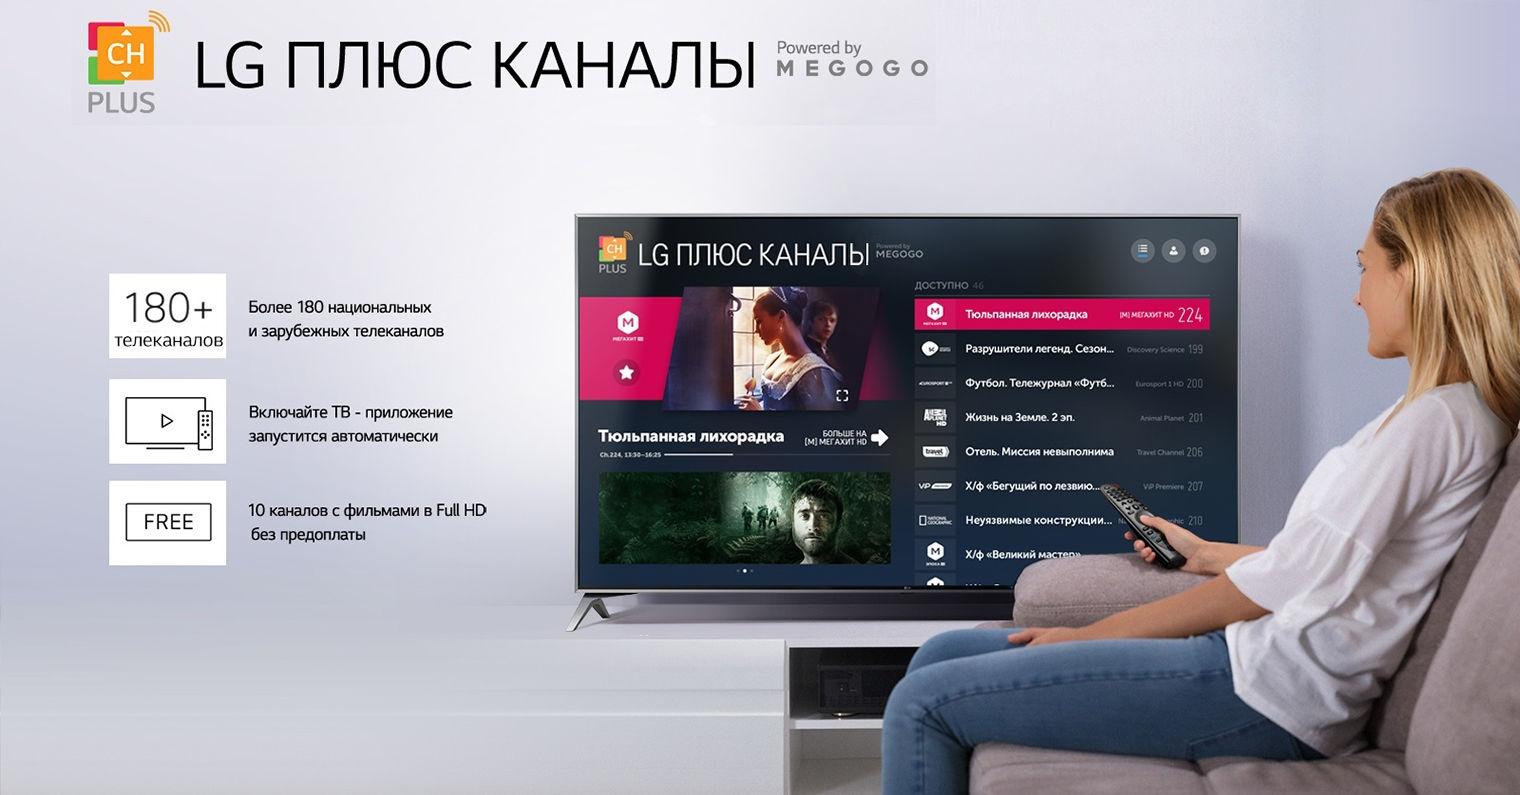 Buy LG LG 43 Inches LED TV, 43LK5910PLC - Black online   Jumia Uganda